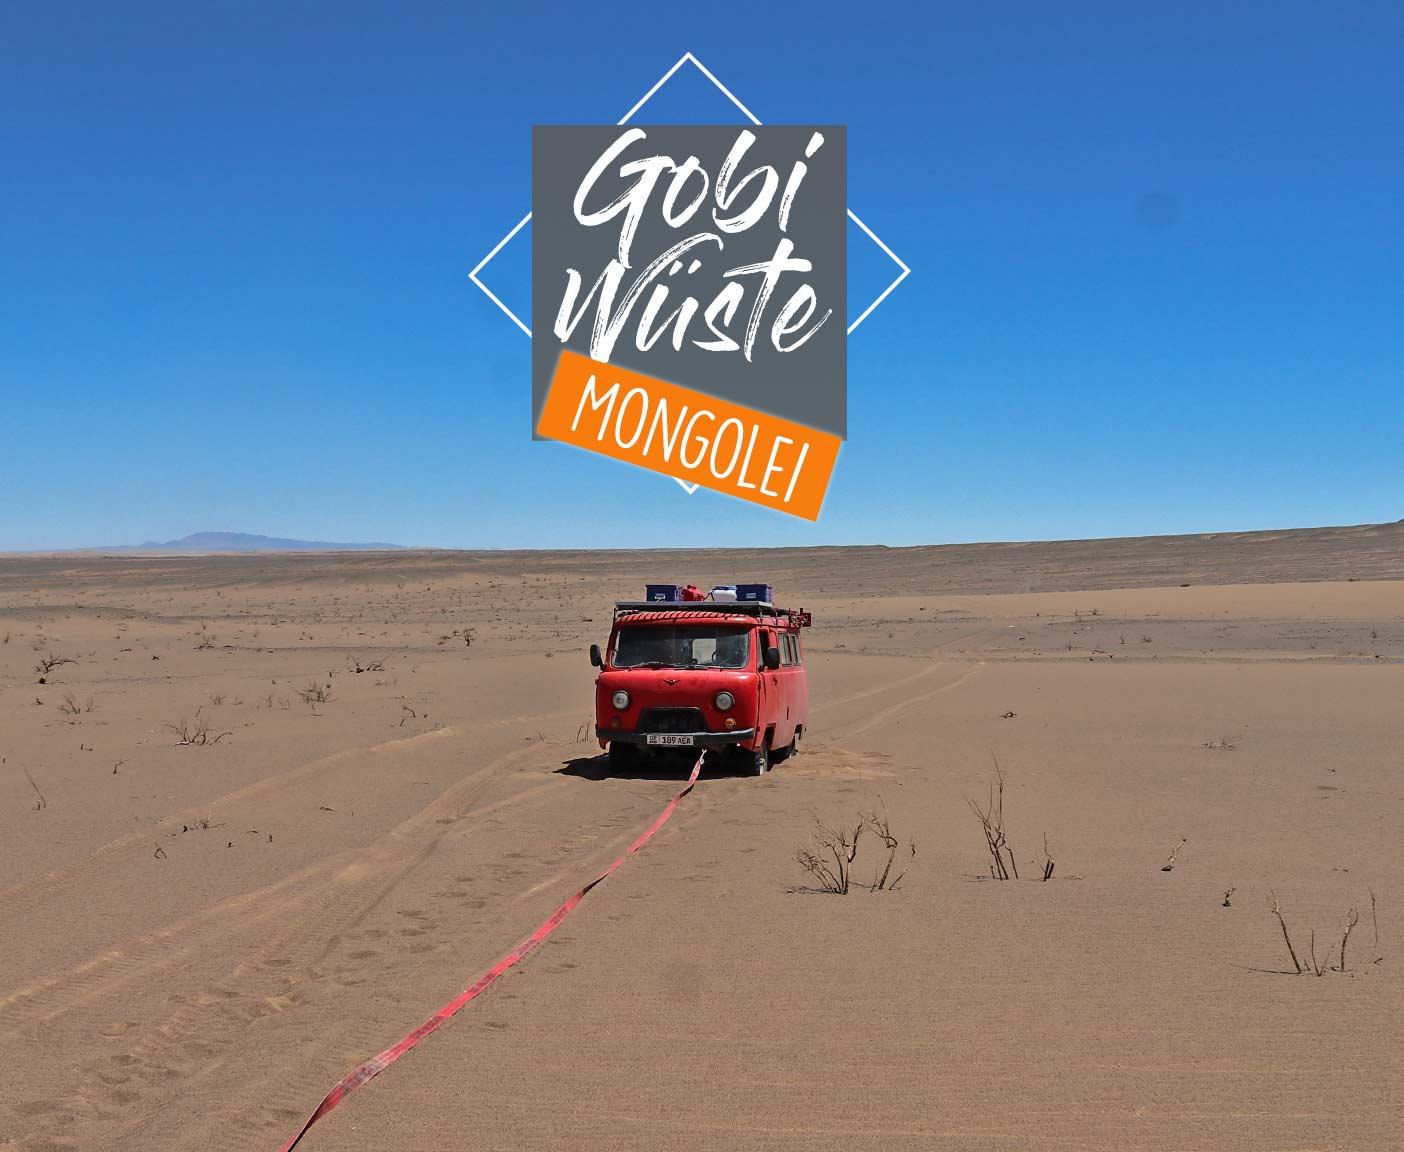 mongolei-festfahren-uaz-reise-camper-gobi-wueste-desert-abenteuer-expedition-4x4